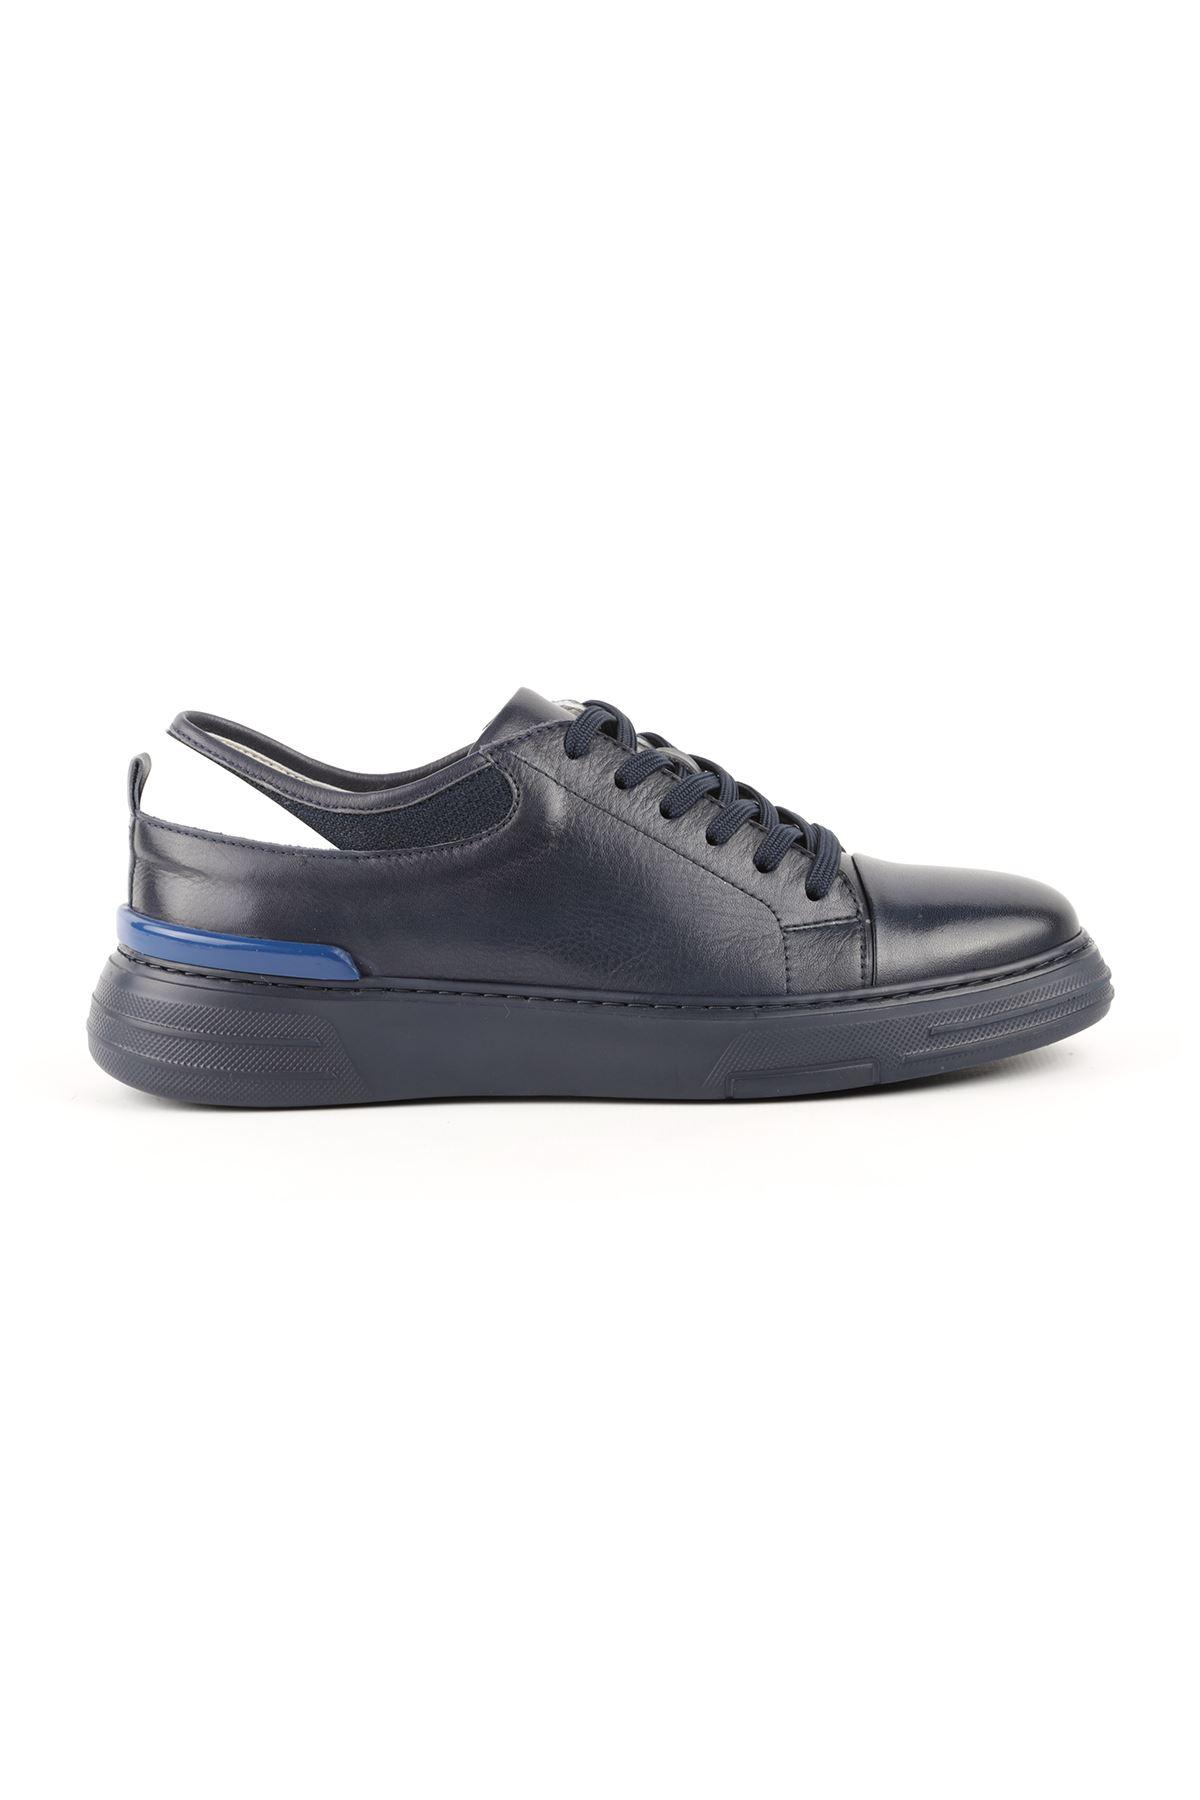 Libero L3793 Lacivert Spor Ayakkabı